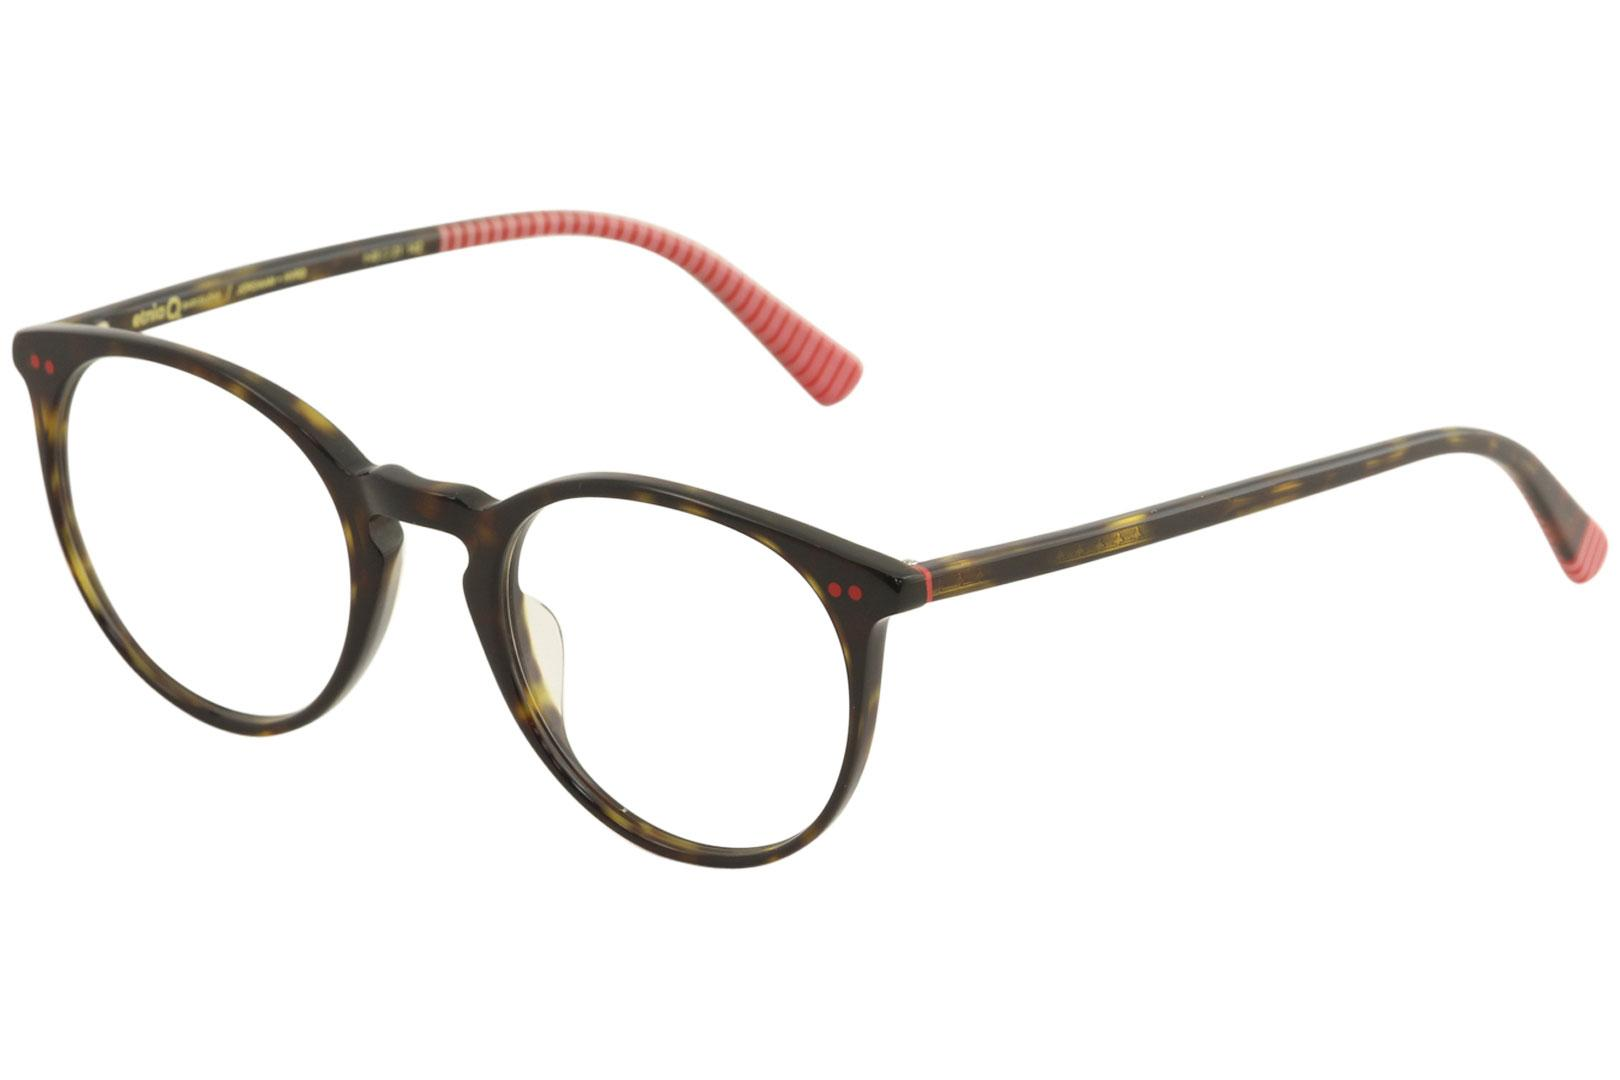 f84c67957de Etnia Barcelona Women s Eyeglasses Vintage Collection Jordaan Optical Frame